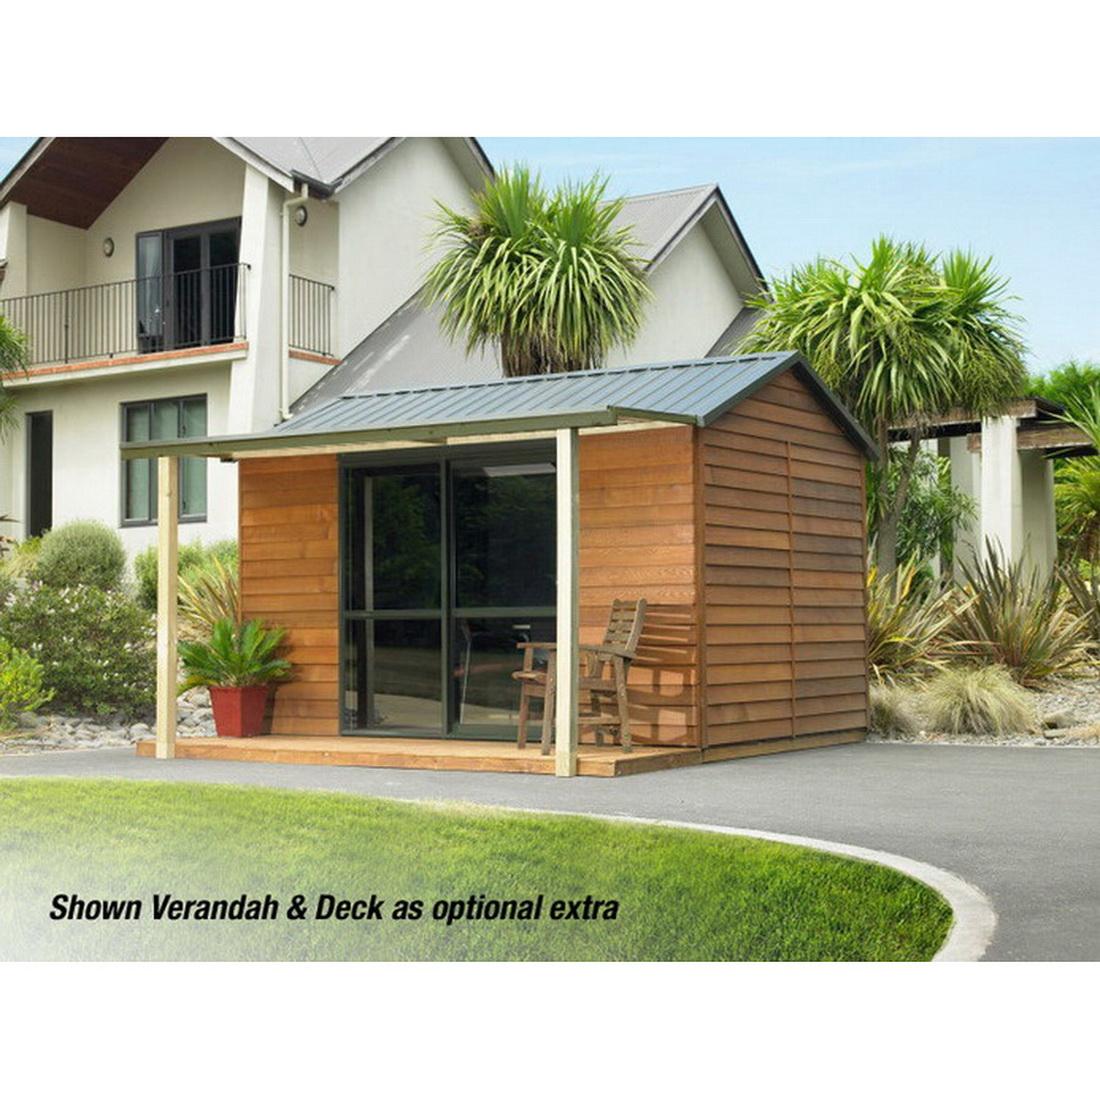 Urban Cabin Kitset Garden Timber Shed 3.6 x 2.5m